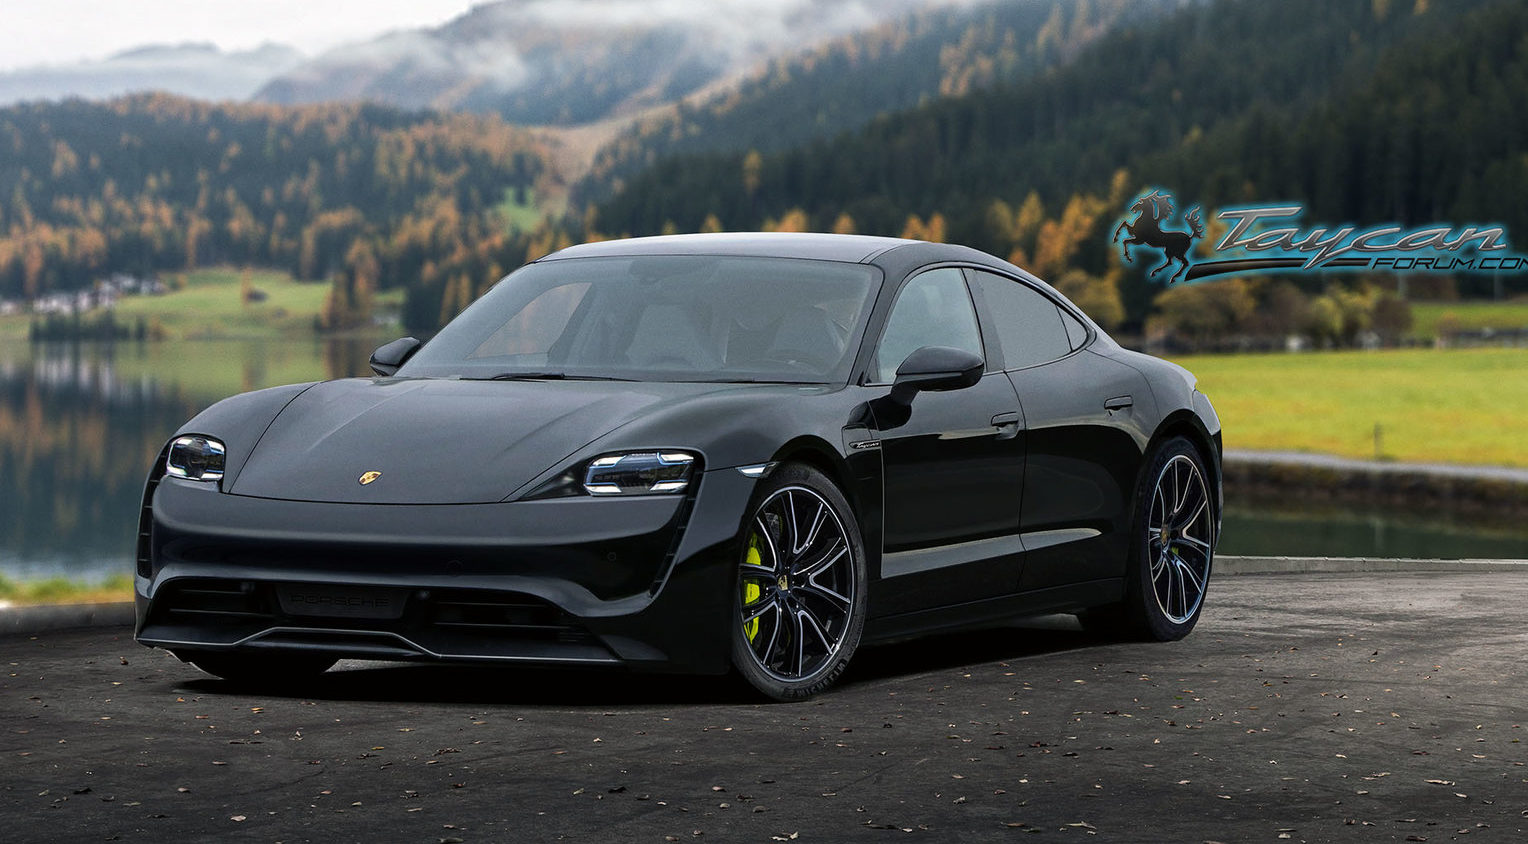 PorscheTaycan_black_front